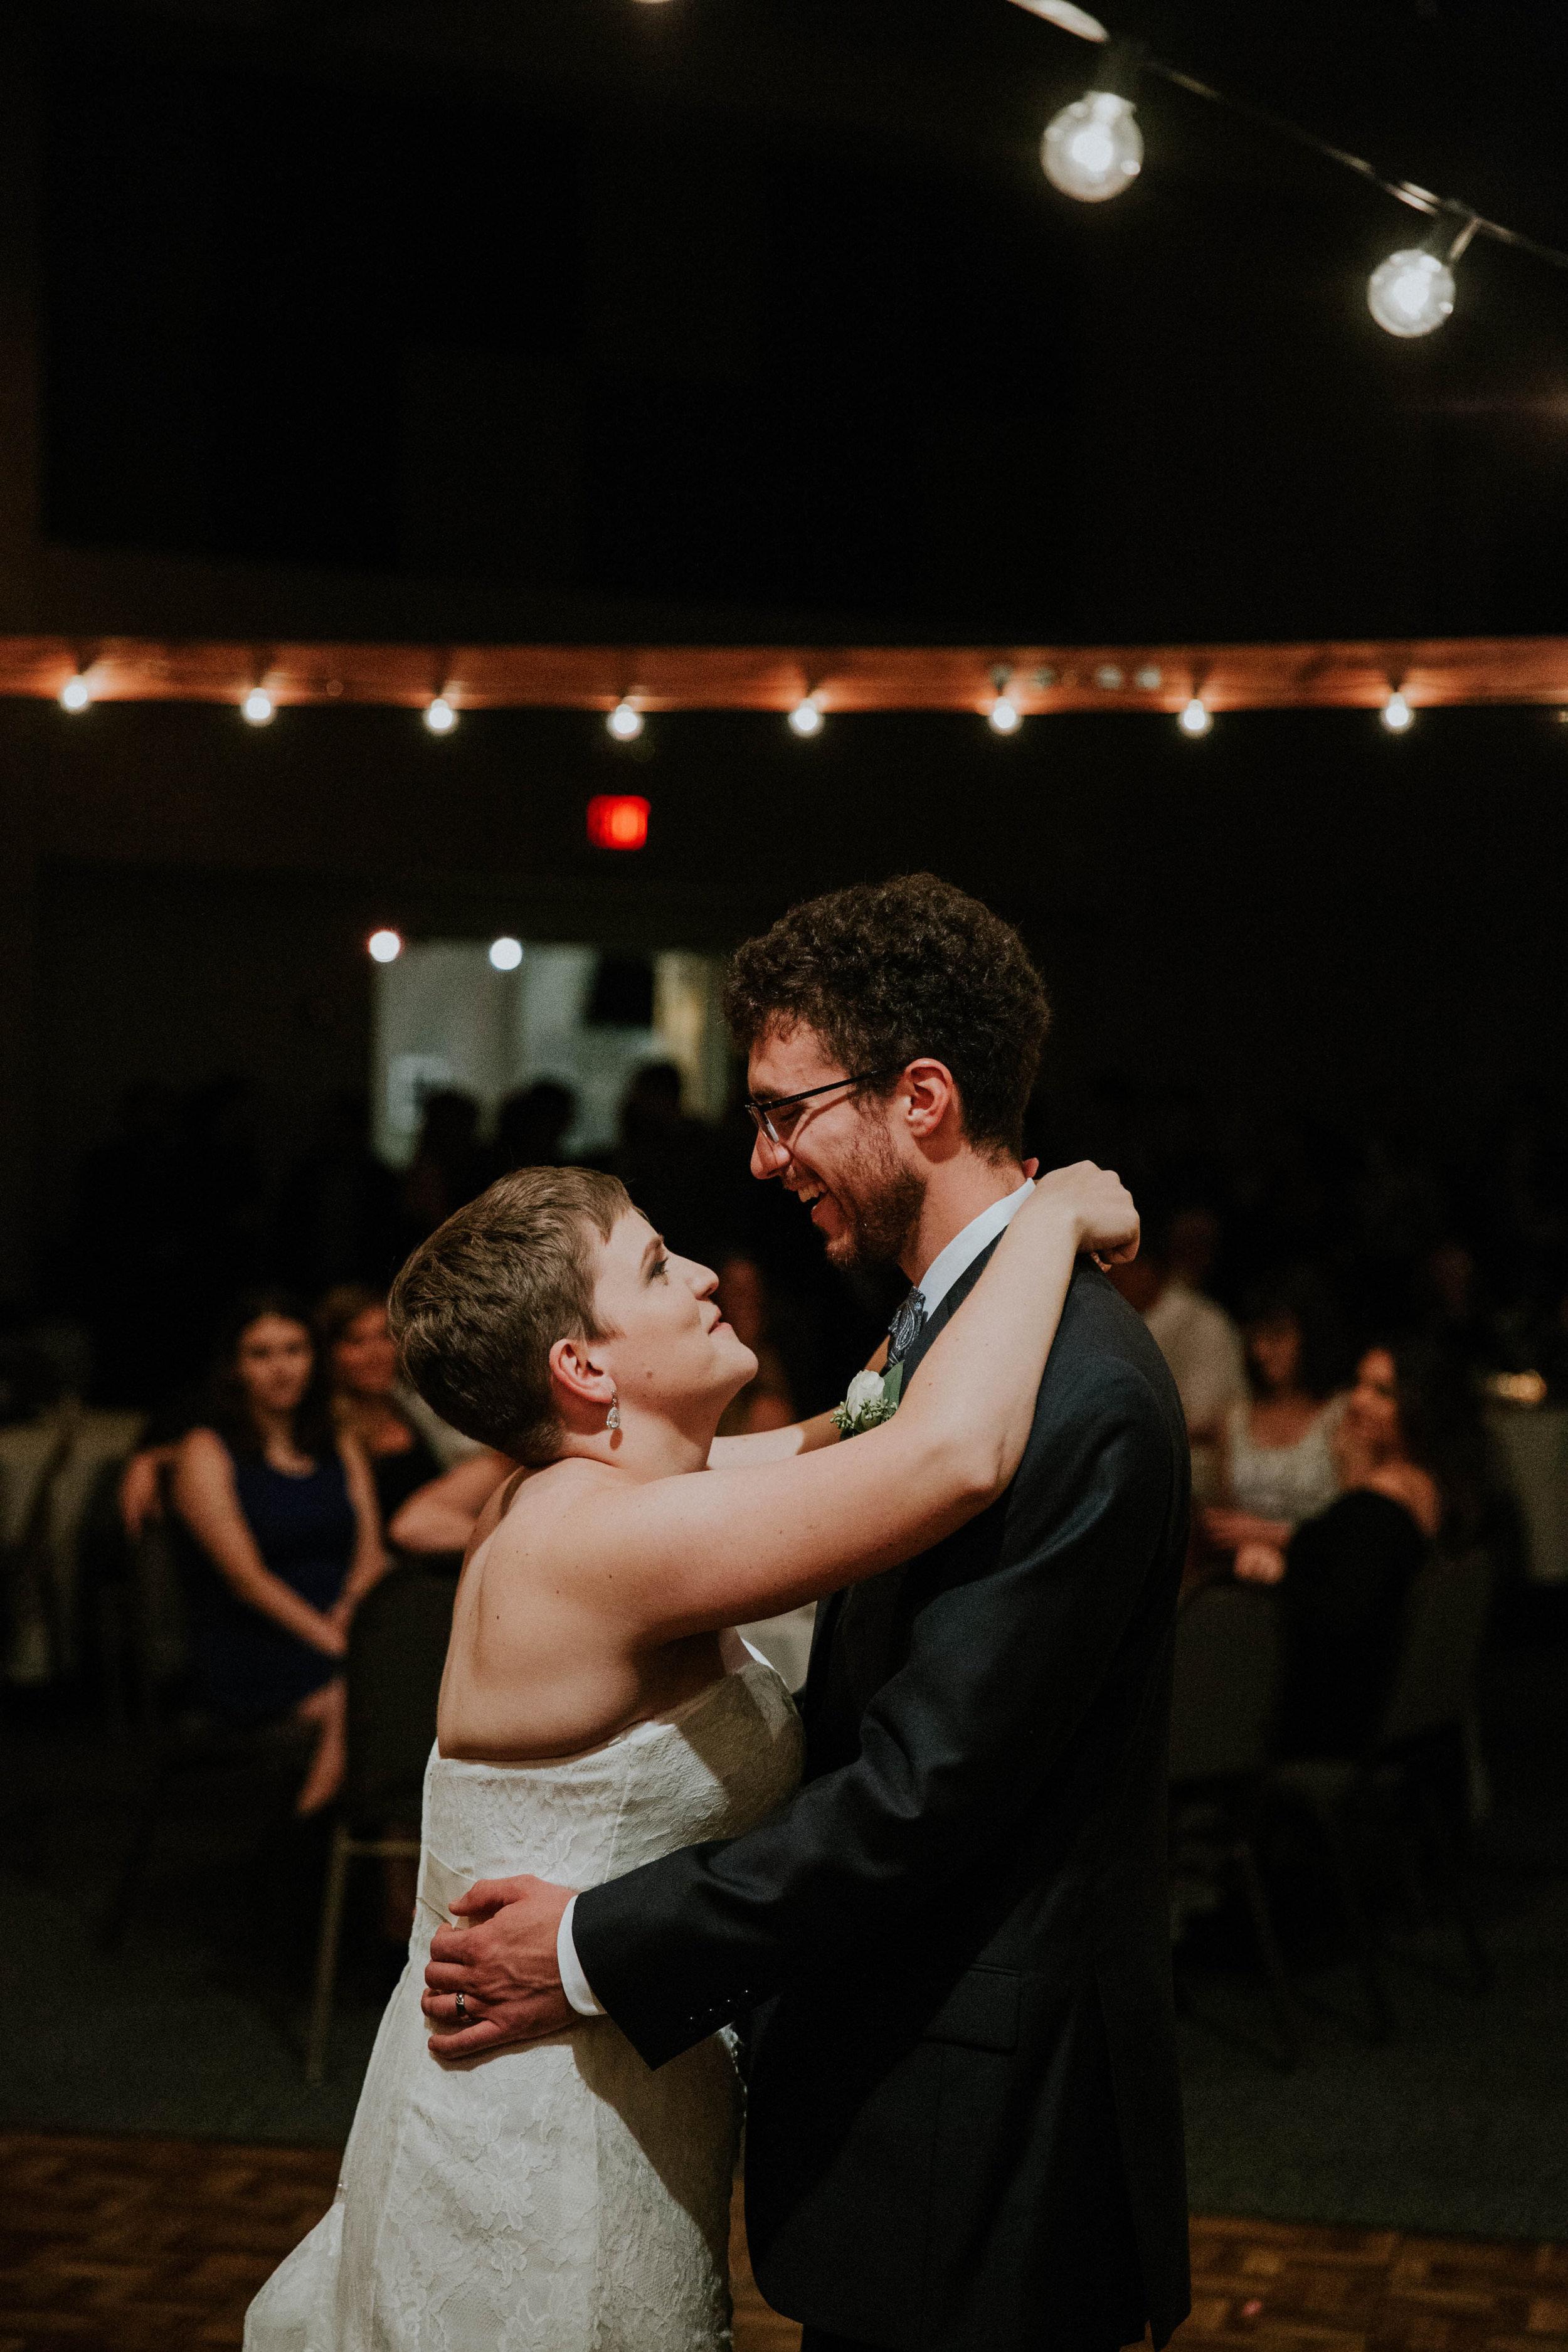 Columbus ohio wedding photographer grace e jones photography real fun joyful wedding133.jpg